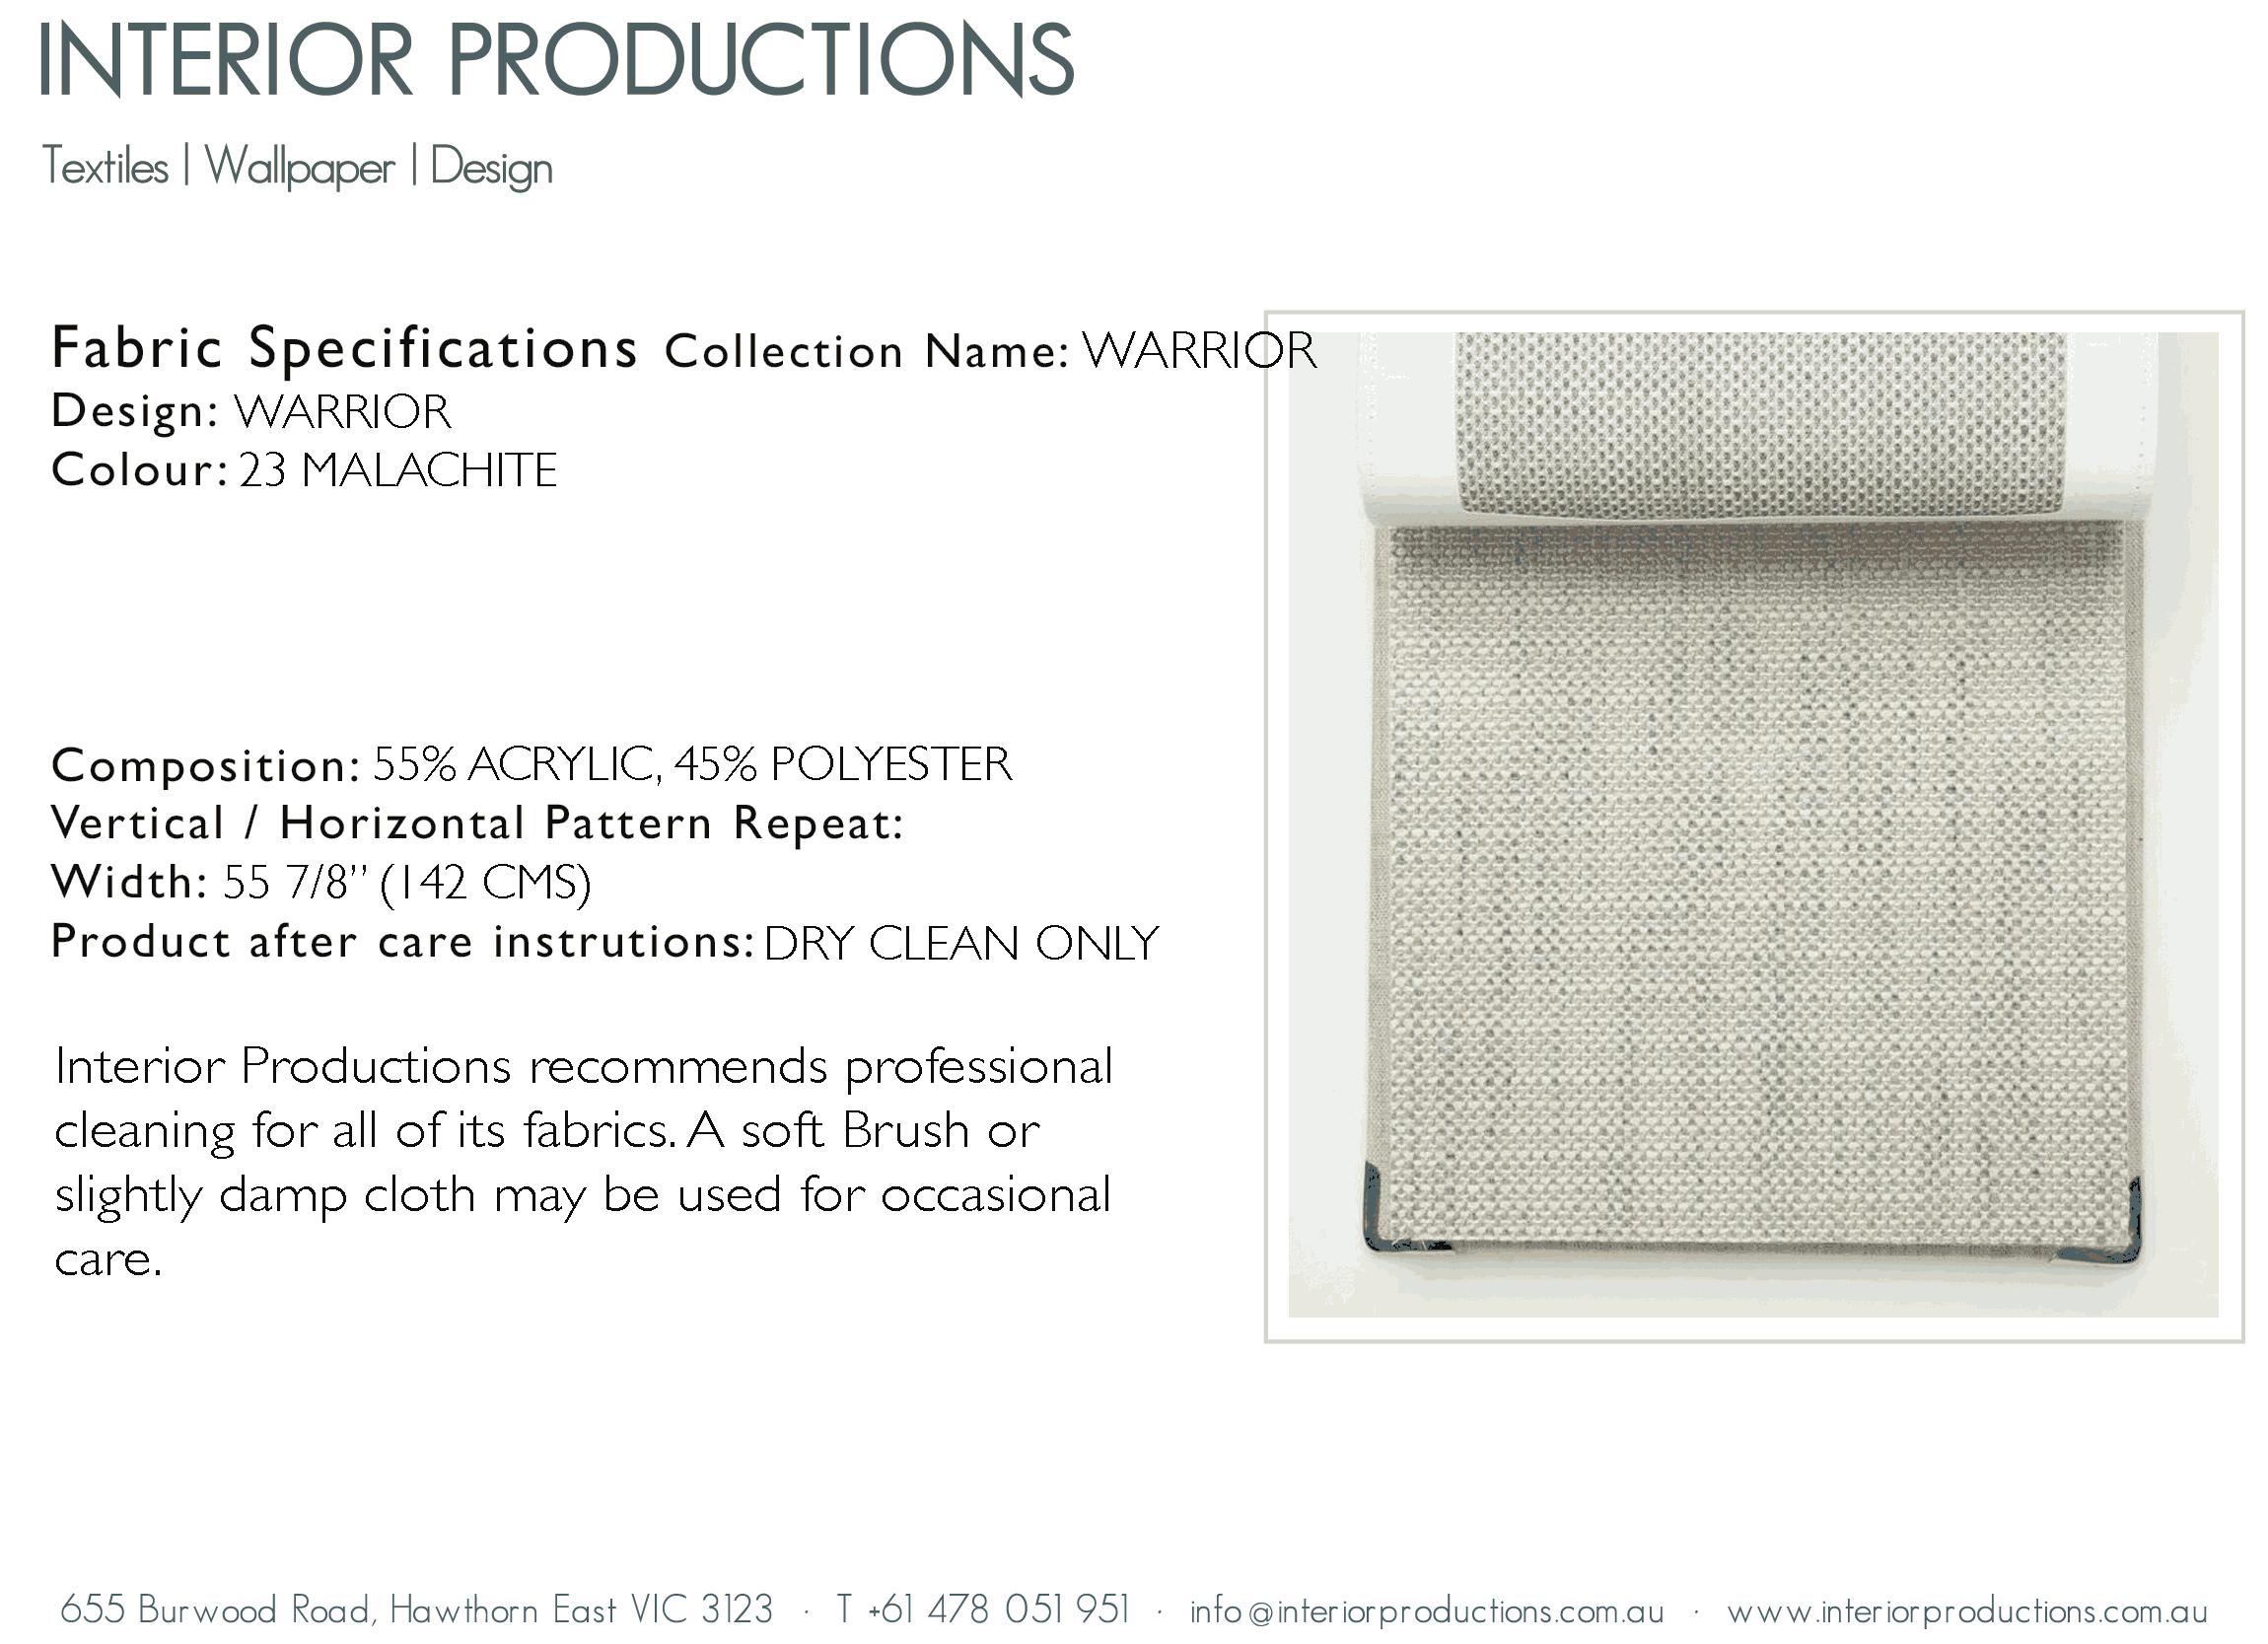 interior_productions_WARRIOR---23-MALACHITE